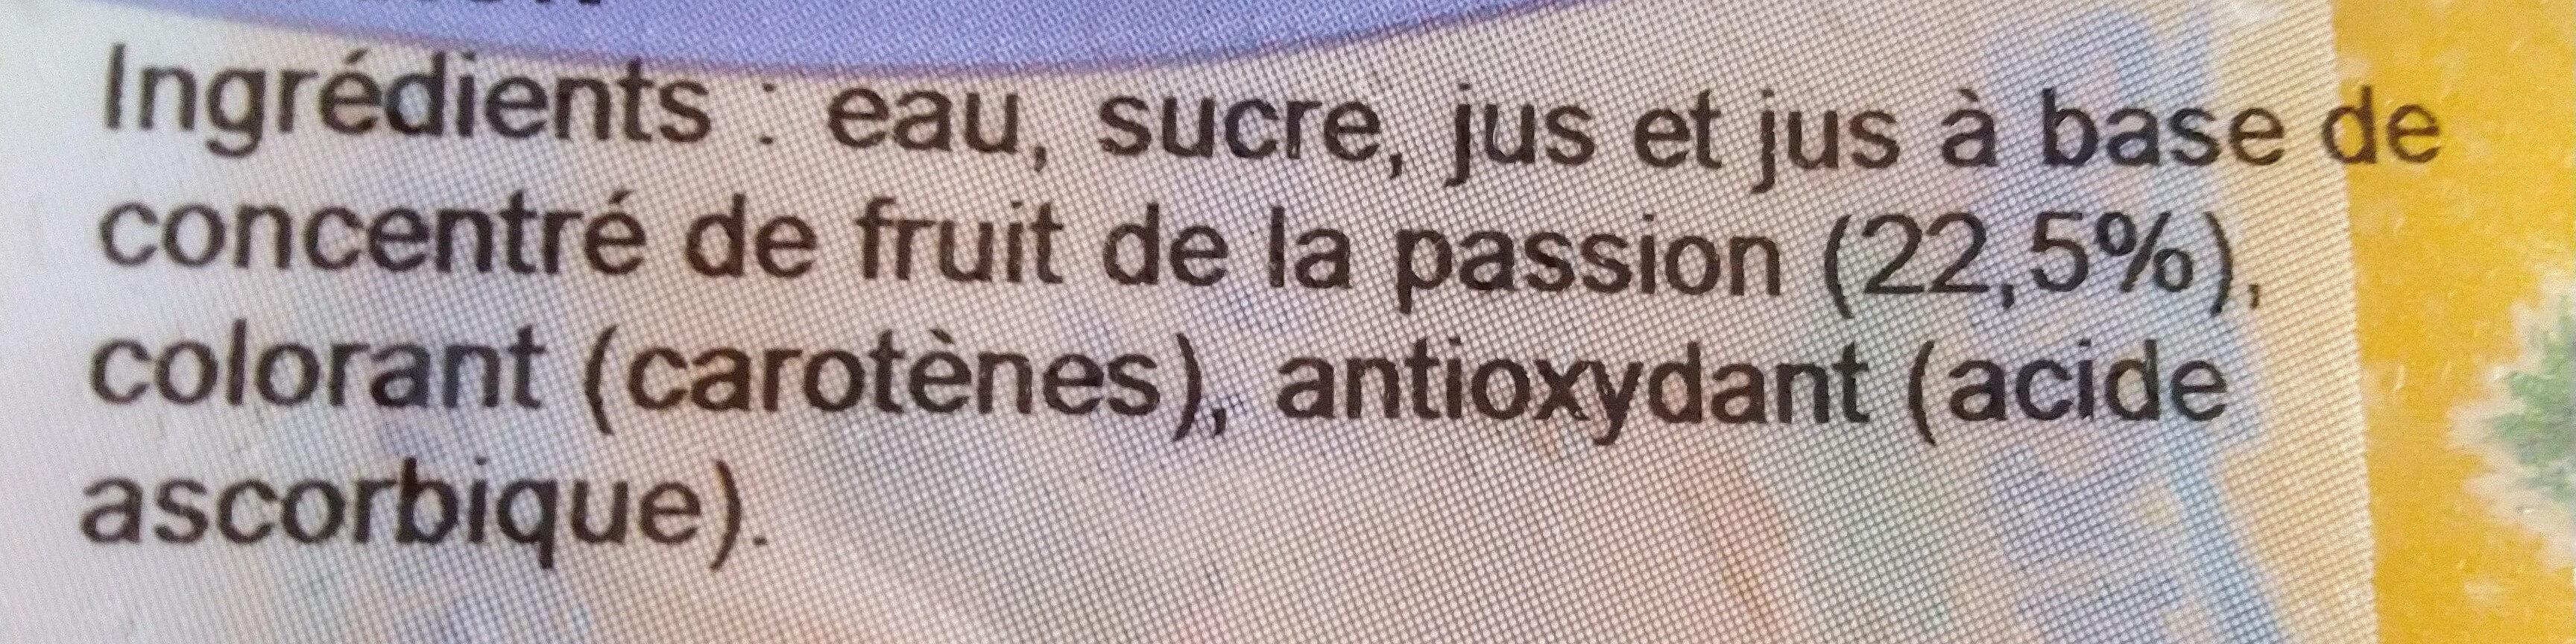 Fruisson - Ingredienti - fr